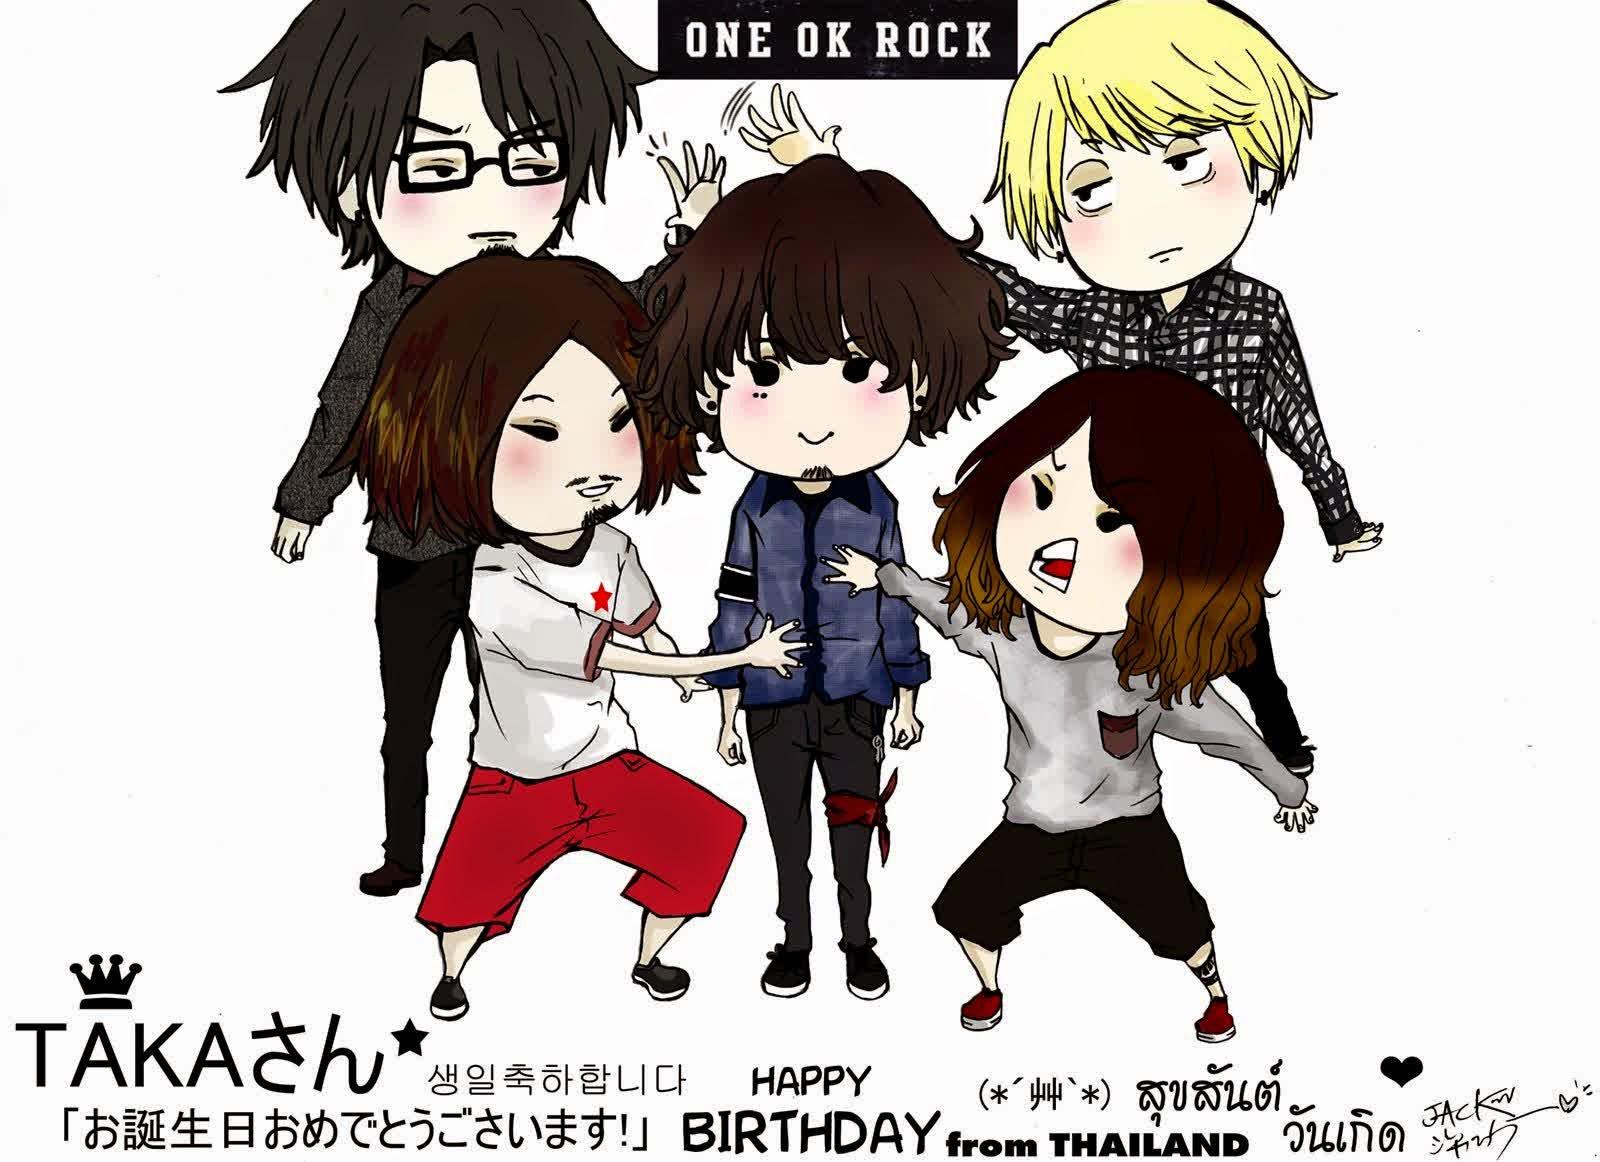 Koleksi Gambar Kartun ONE OK ROCK Kilas Dunia